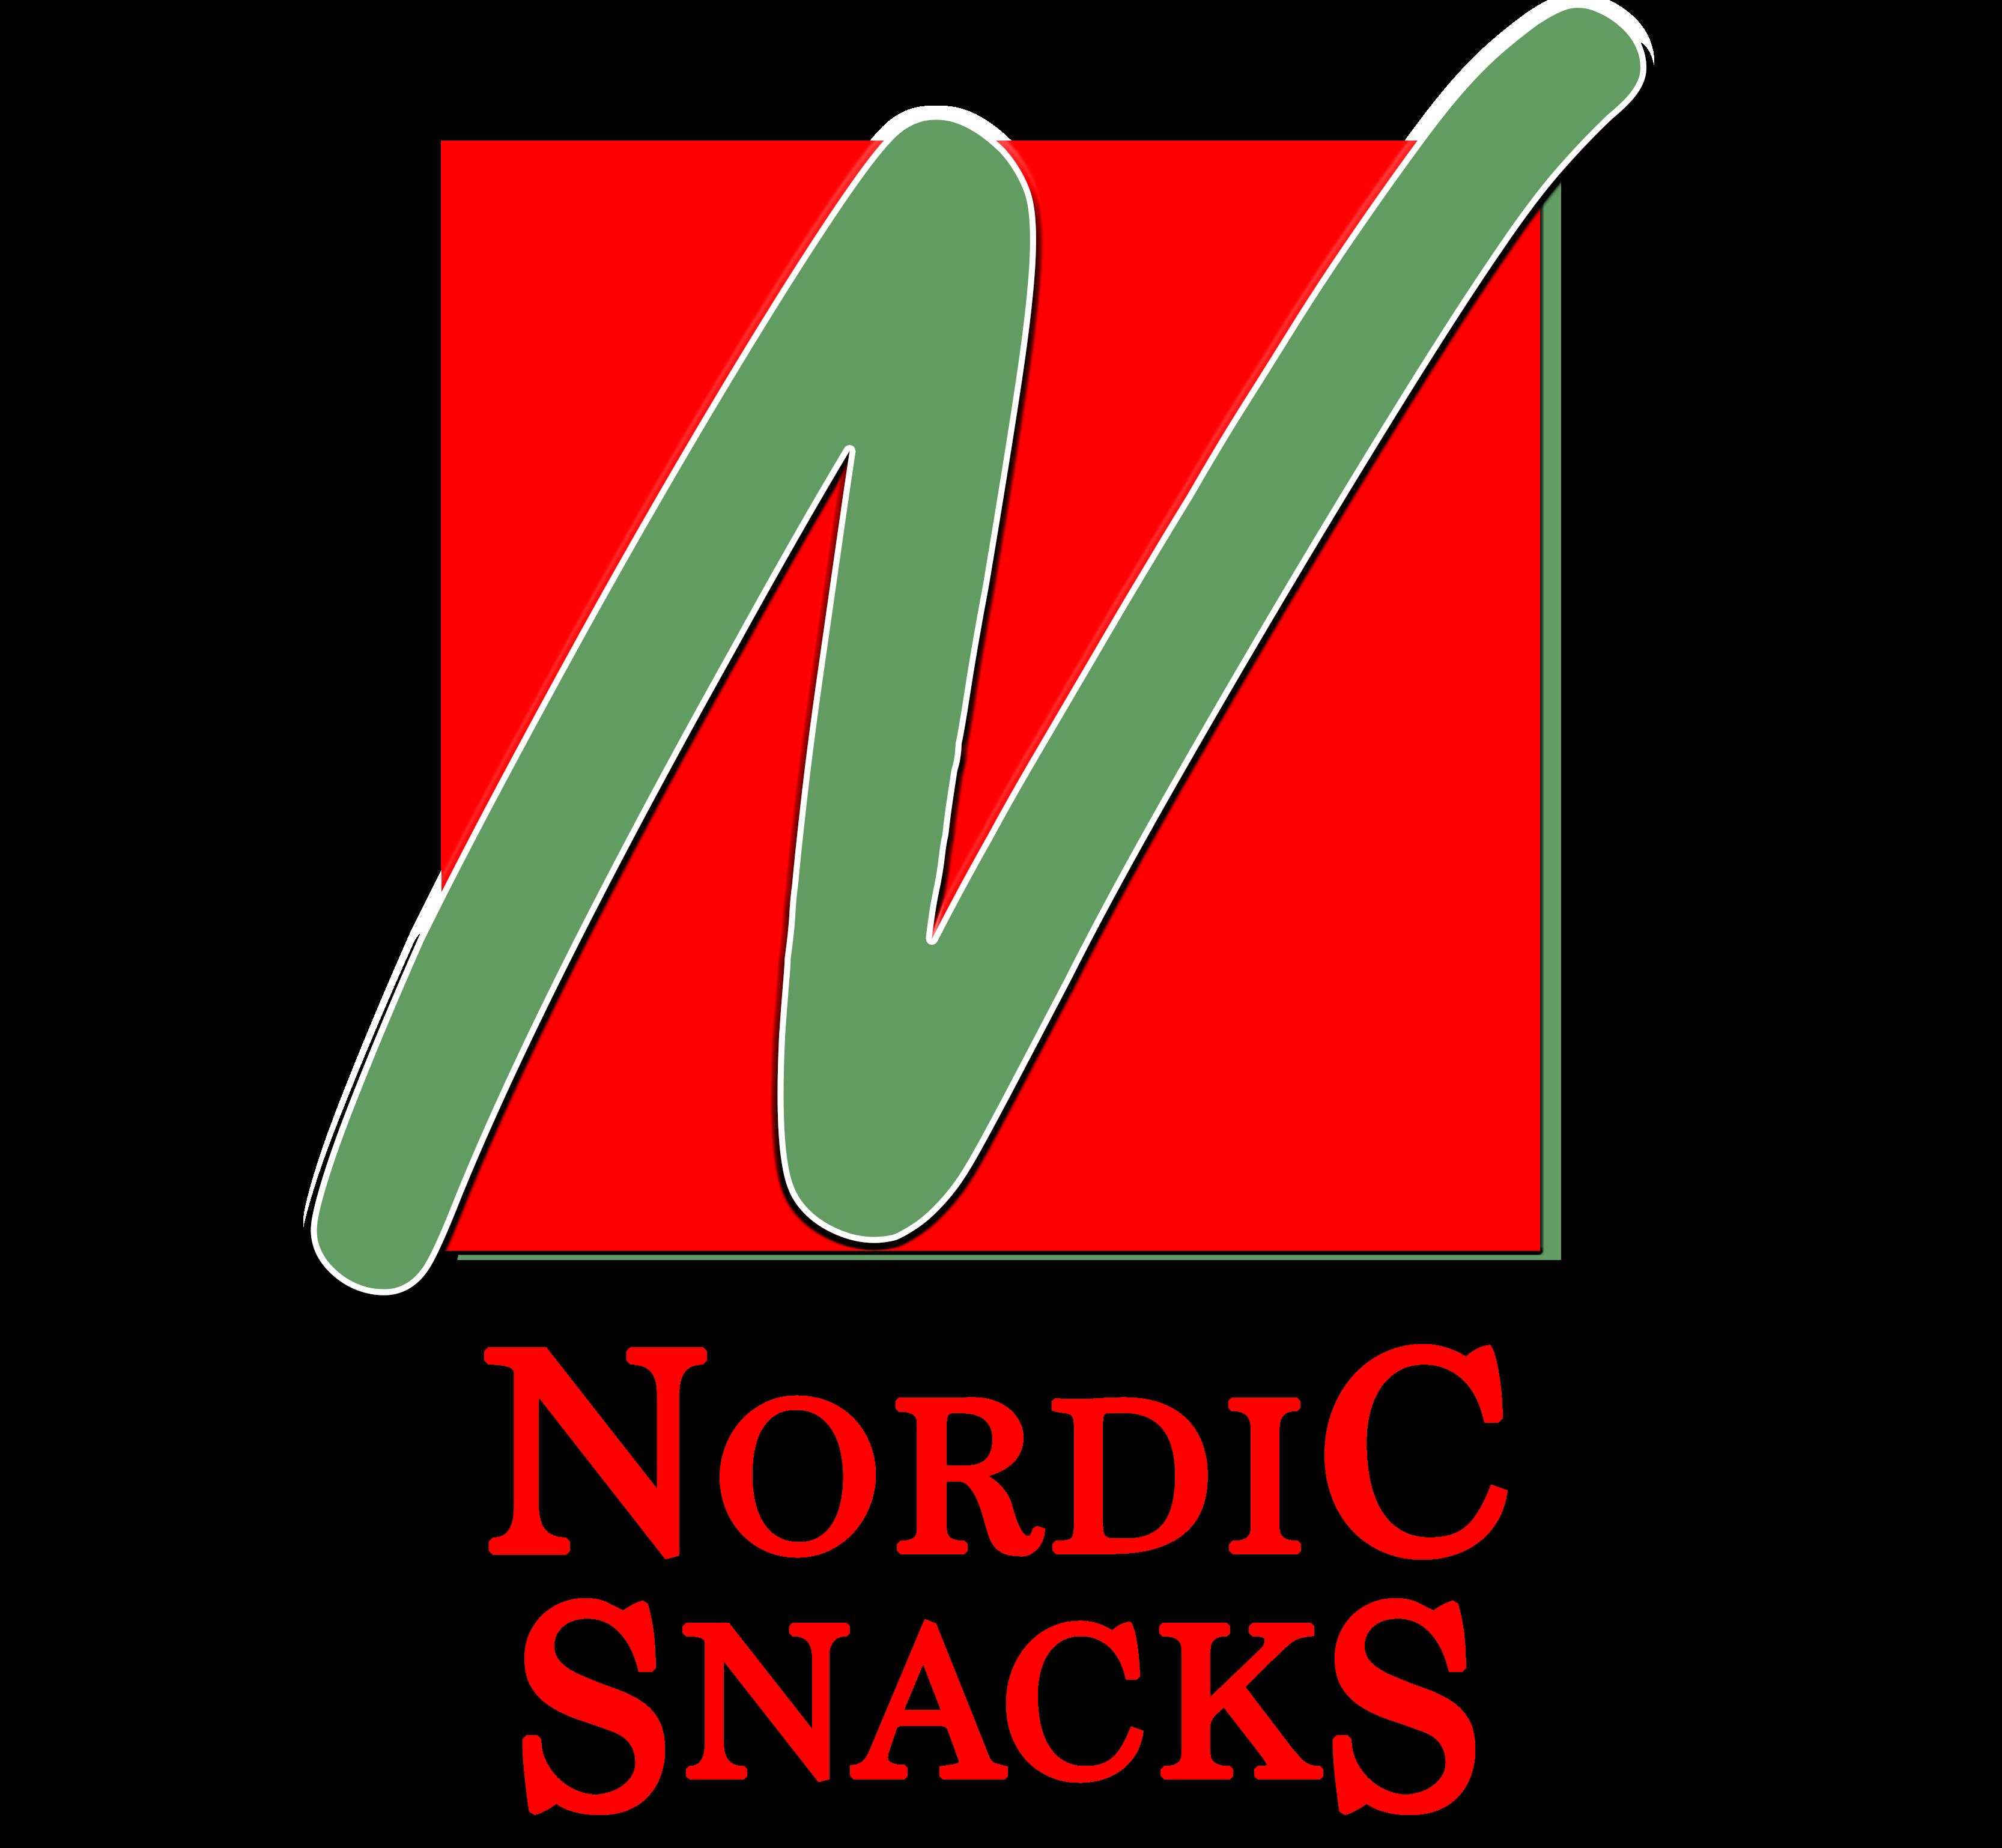 Nordic Snacks